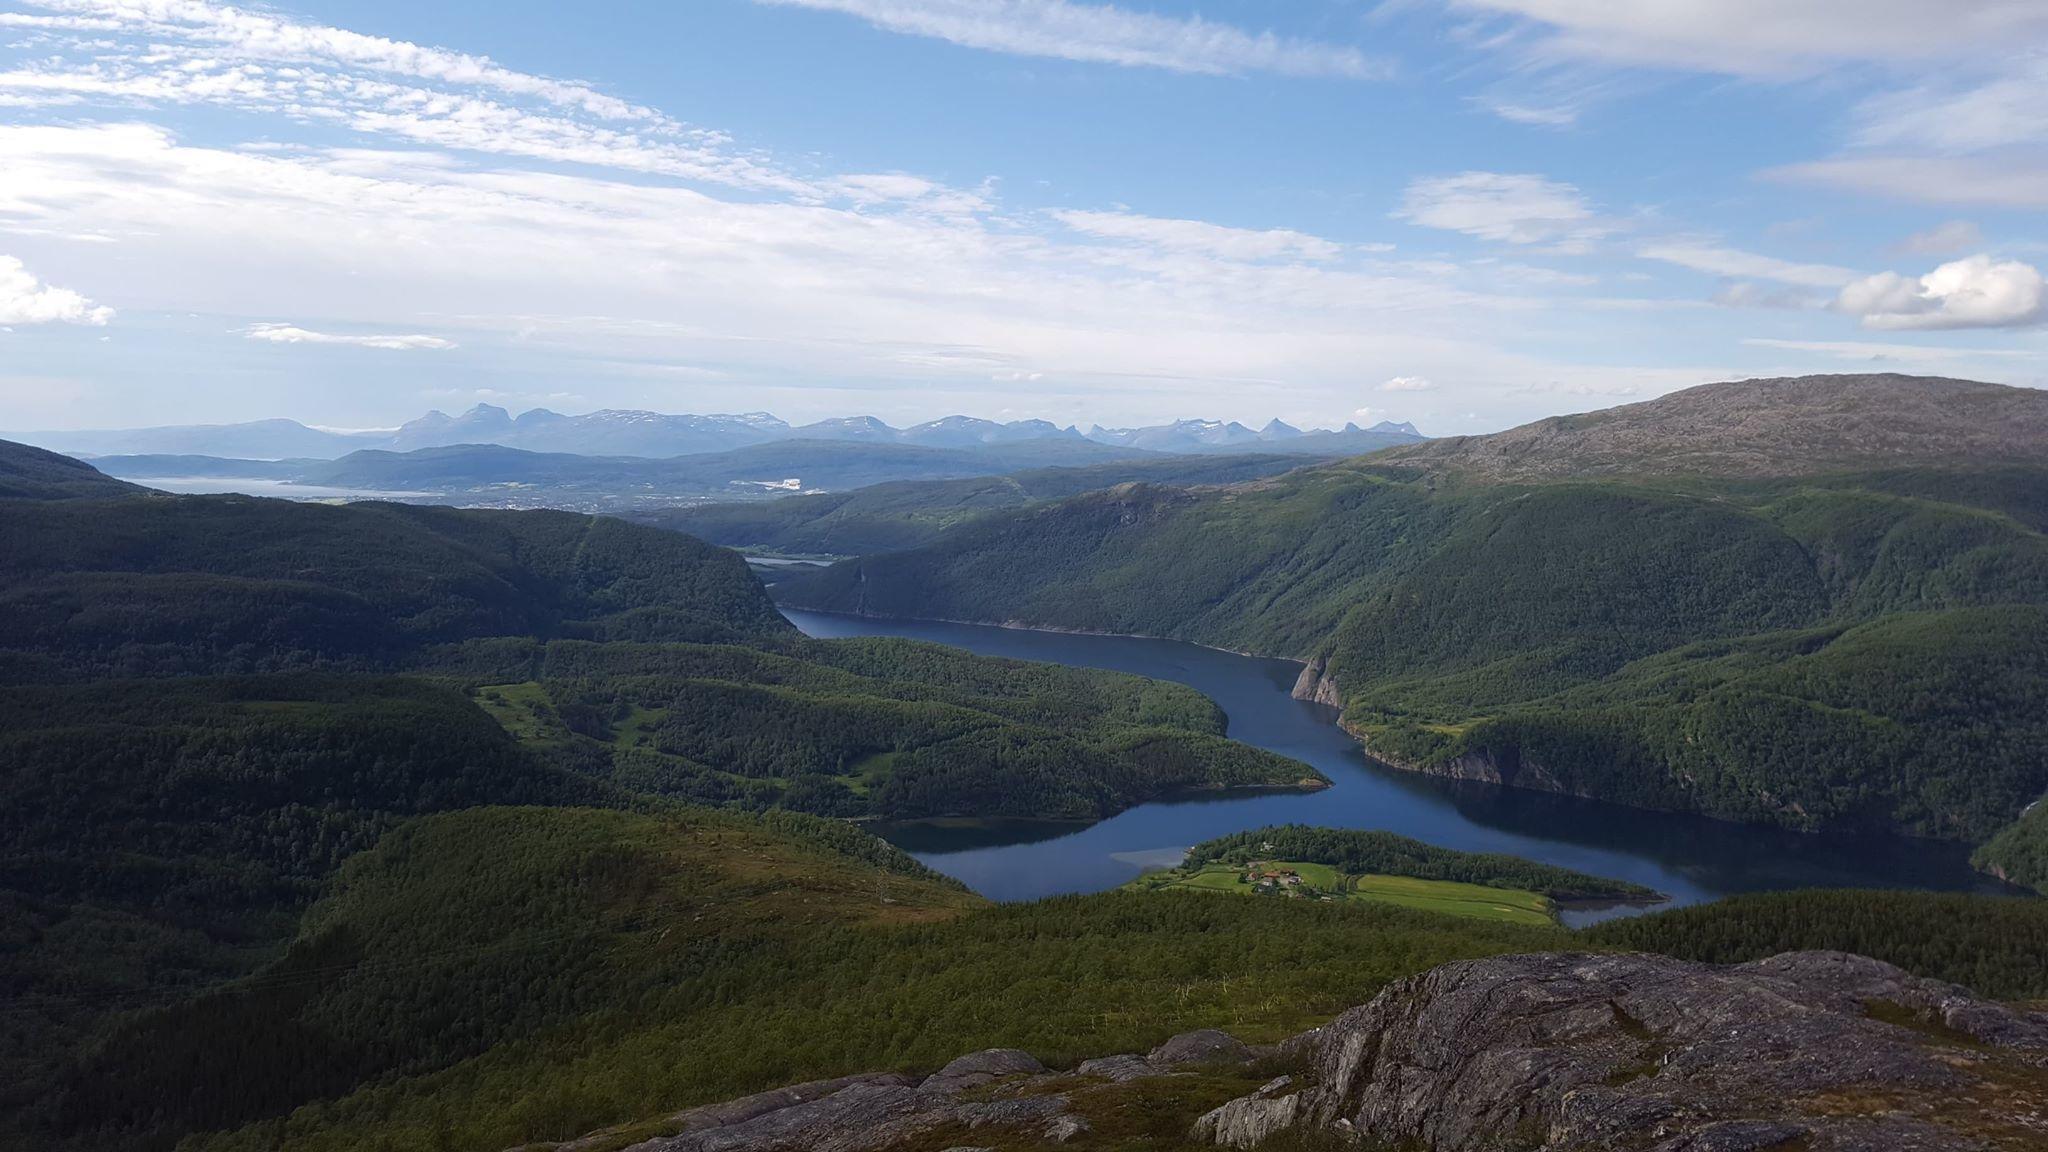 Fauske - Solvika mot Lofoten juli 2018